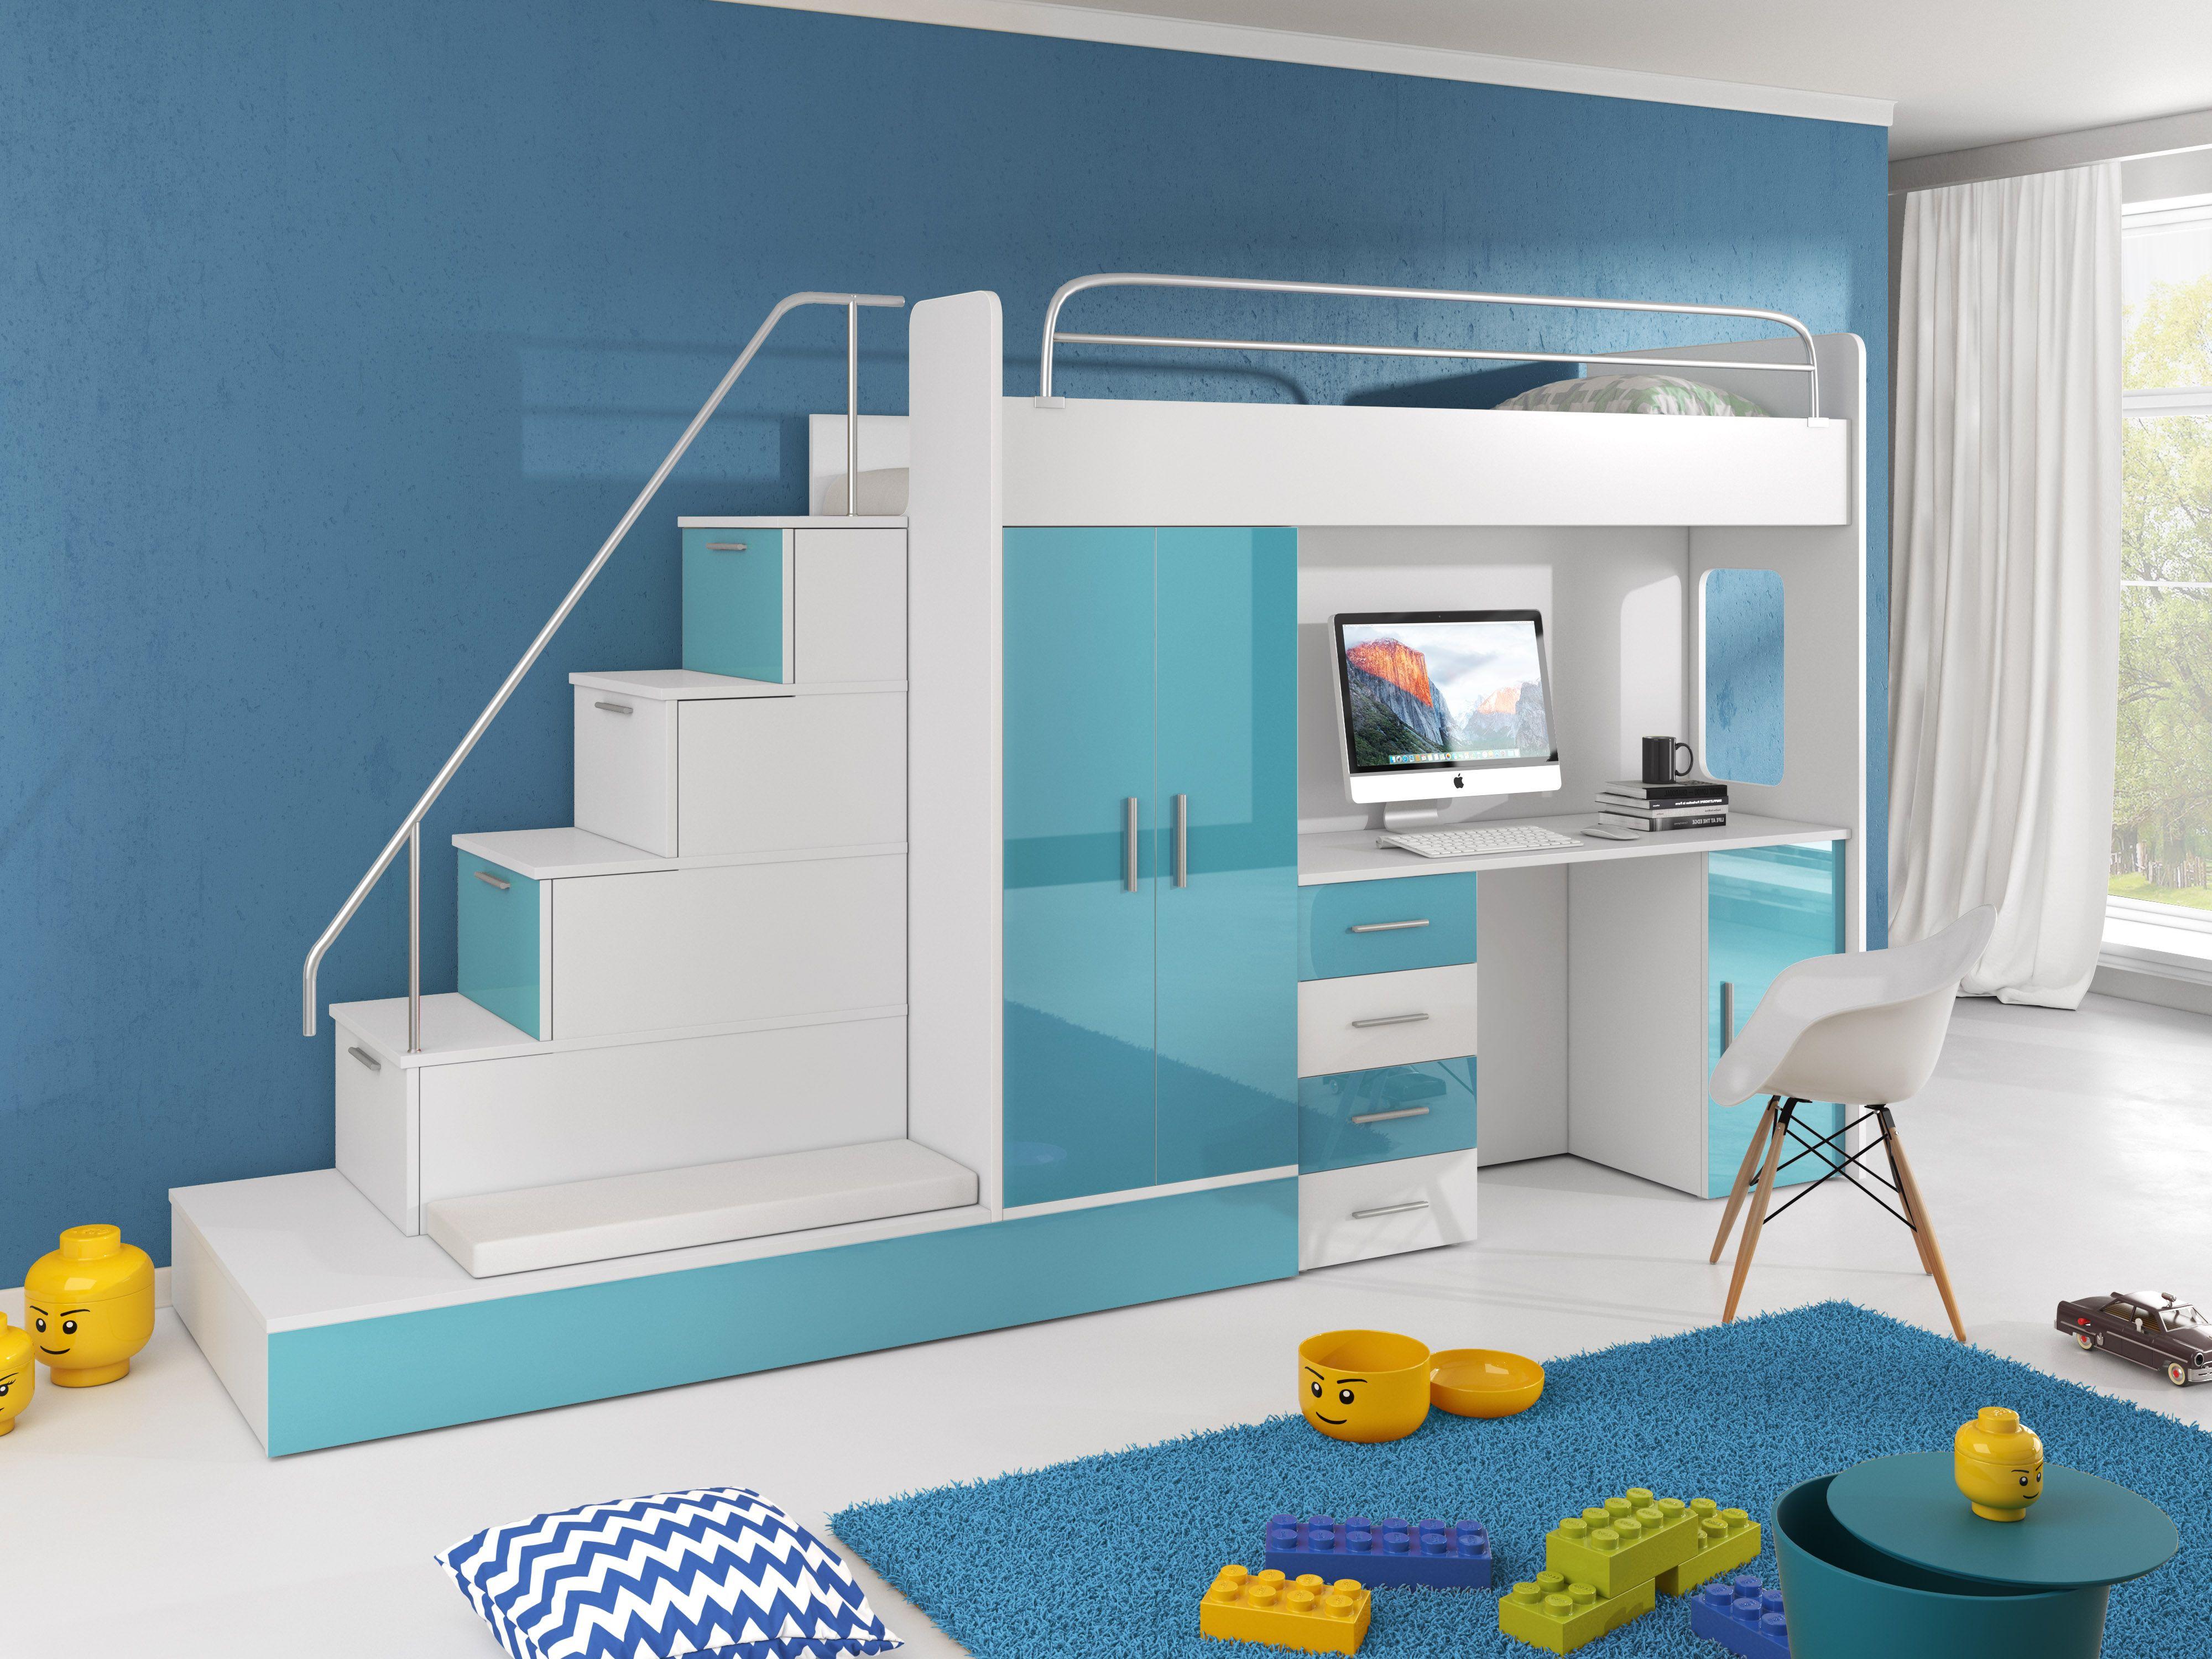 Etagenbett Julien : Paradise hochbett 5 azurblau 80x200cm möbel zeit